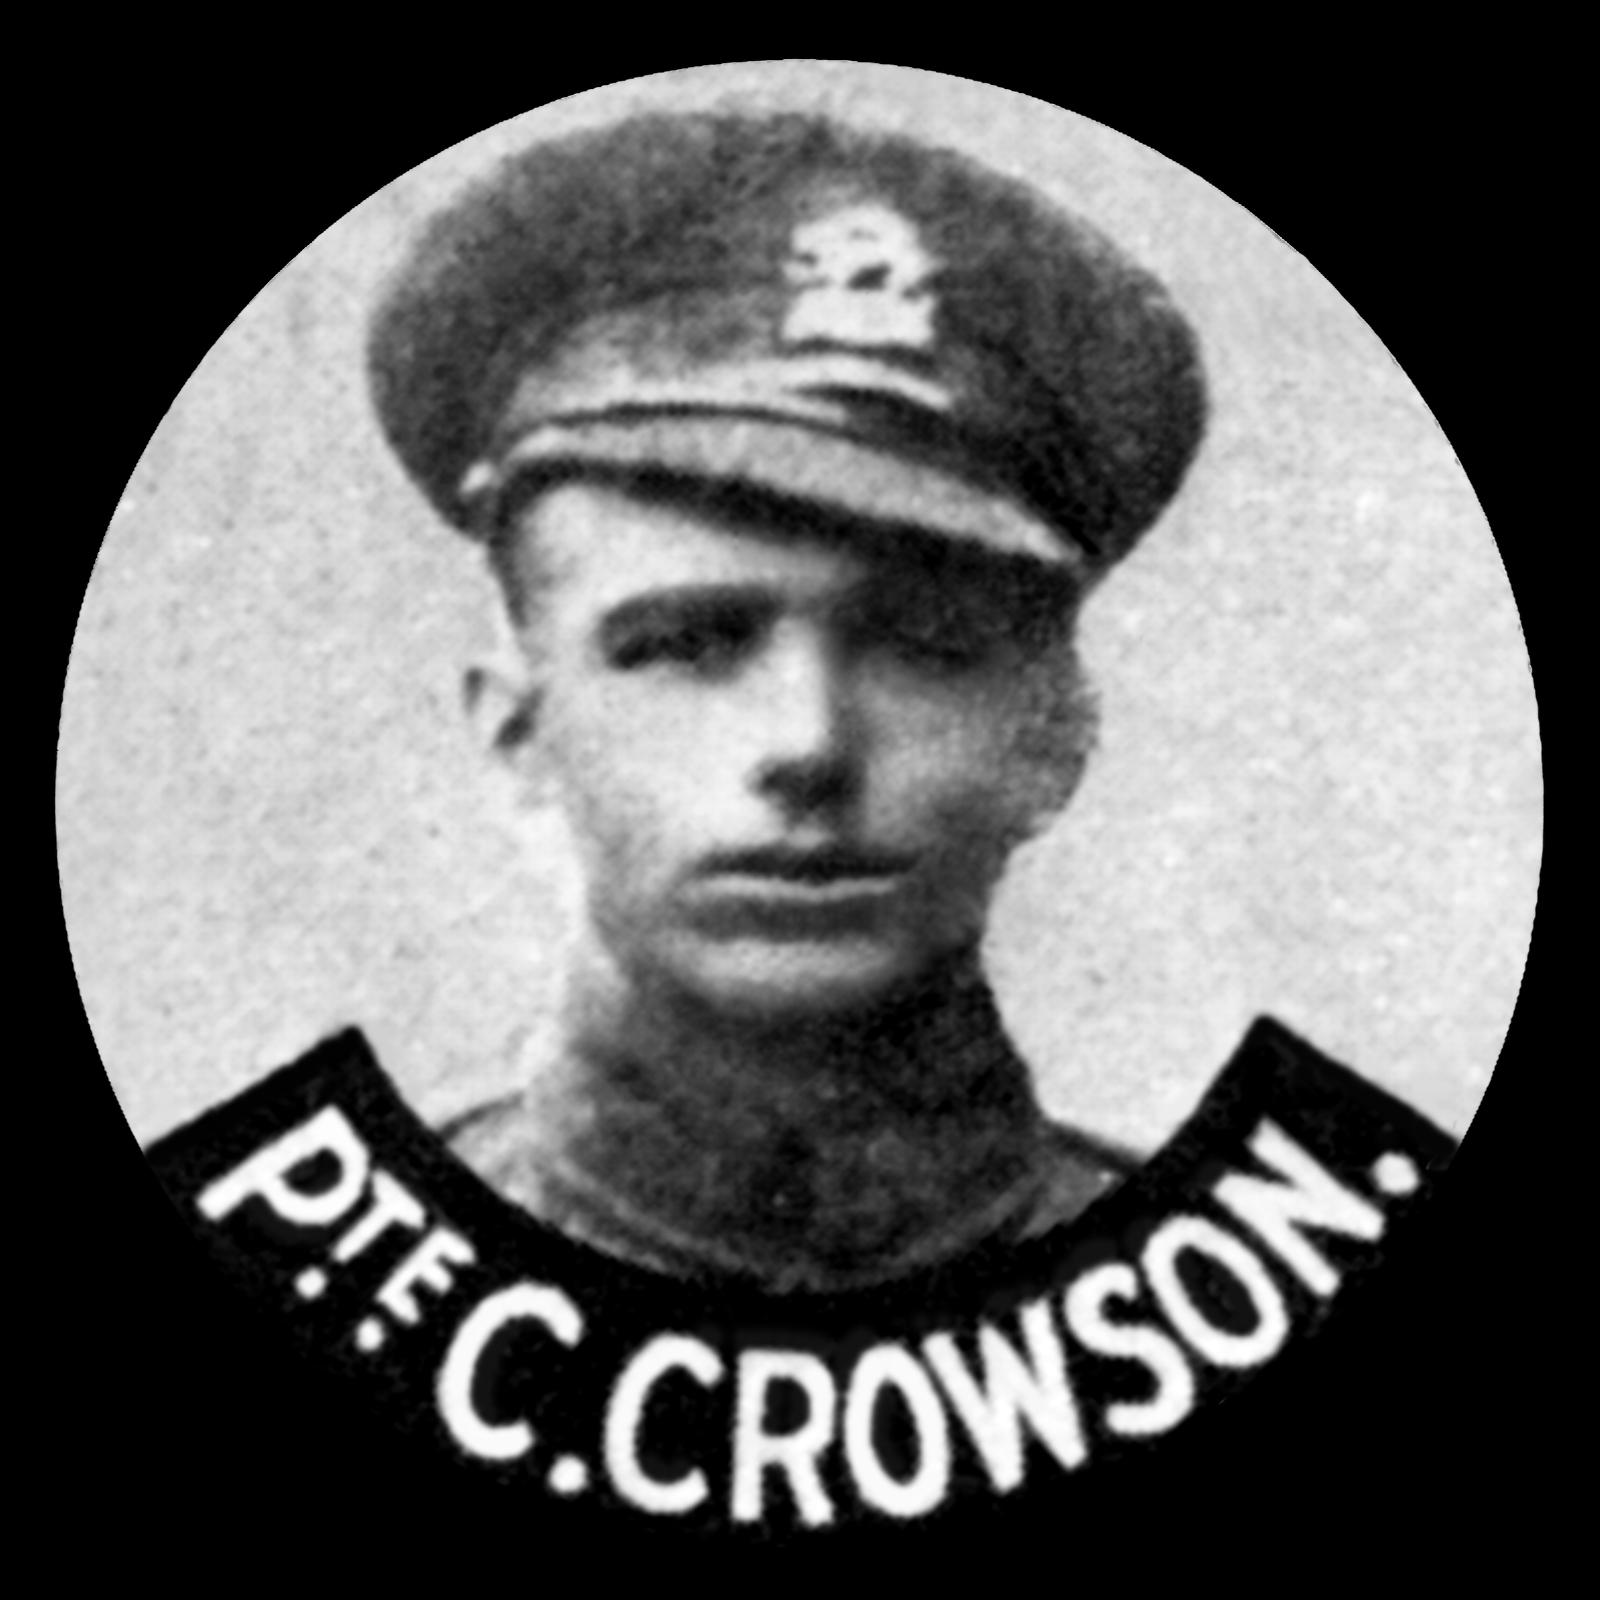 CROWSON Claude